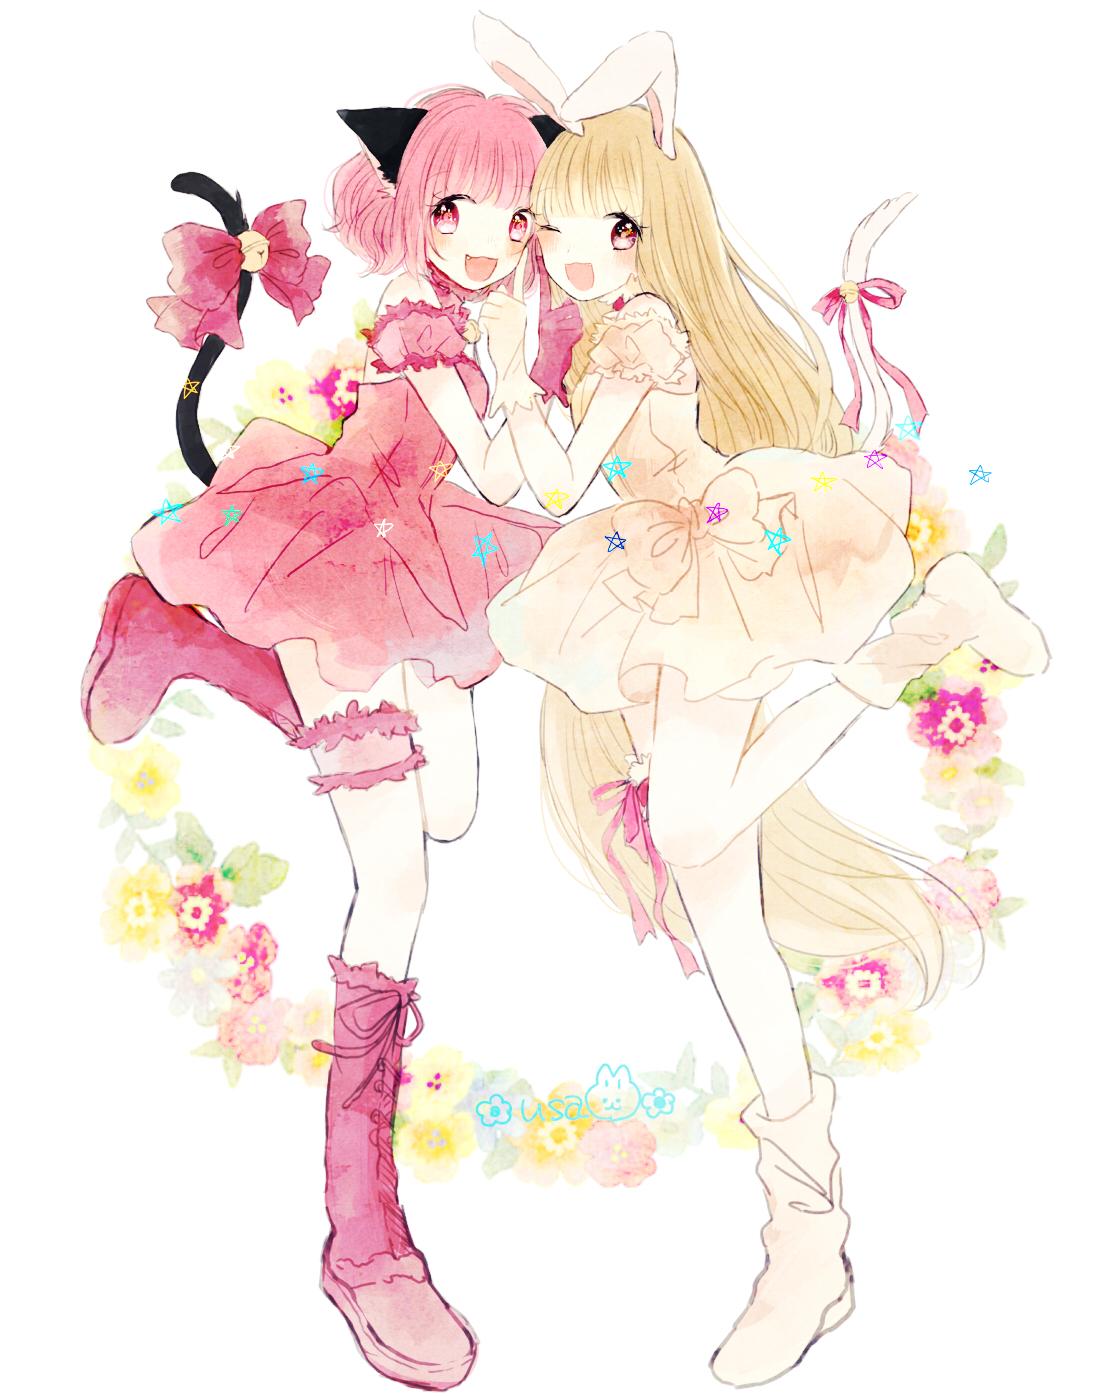 Mew Berry Shirayuki Berry Zerochan Anime Image Board